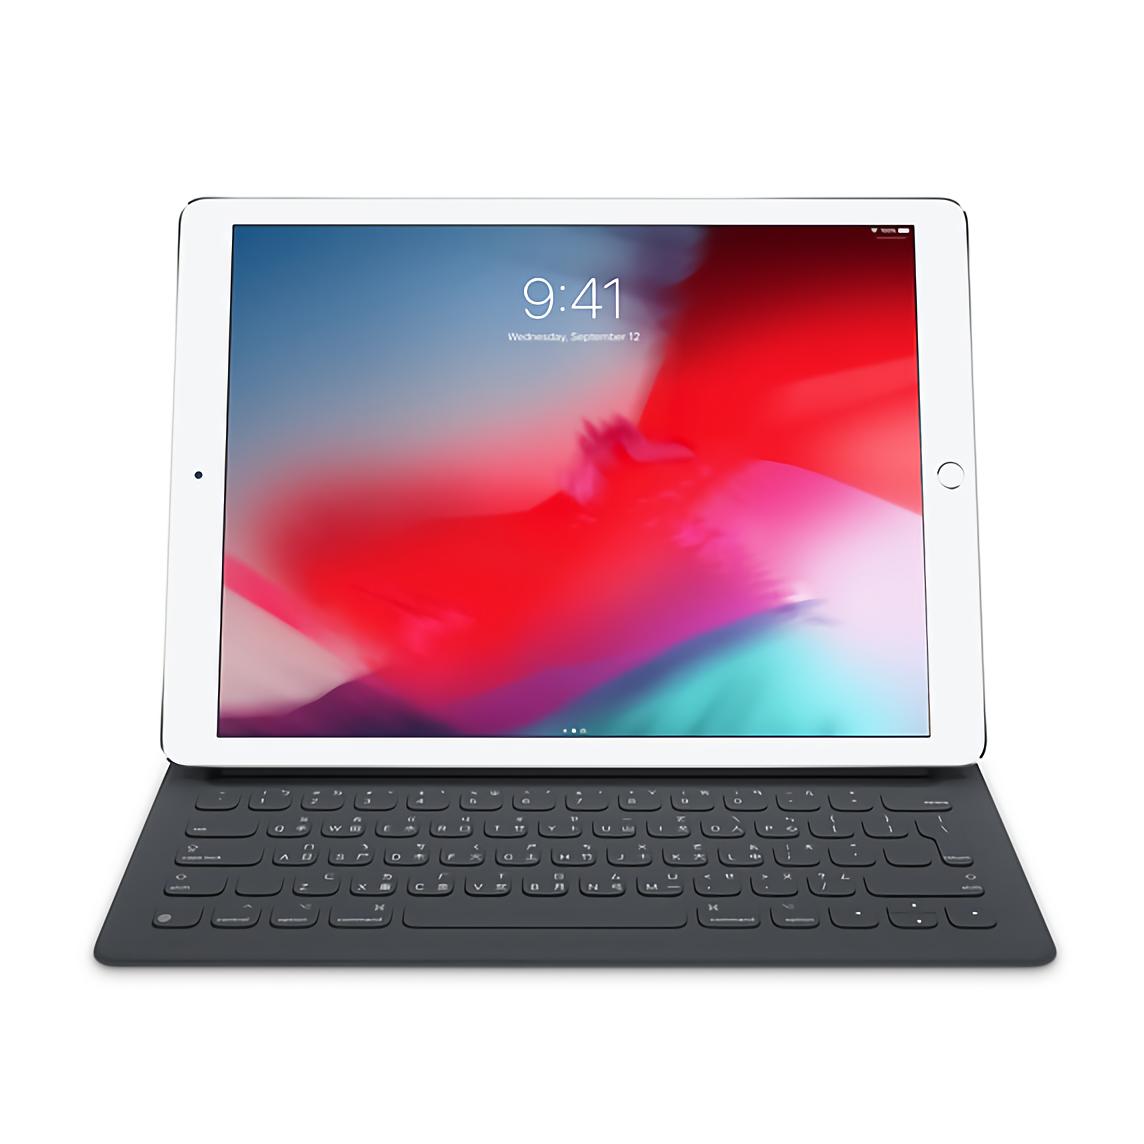 ★每月4 / 14 / 24號 點數三倍★ Apple Smart Keyboard for 12.9吋 iPad Pro (美式英文) 佳成數位 1